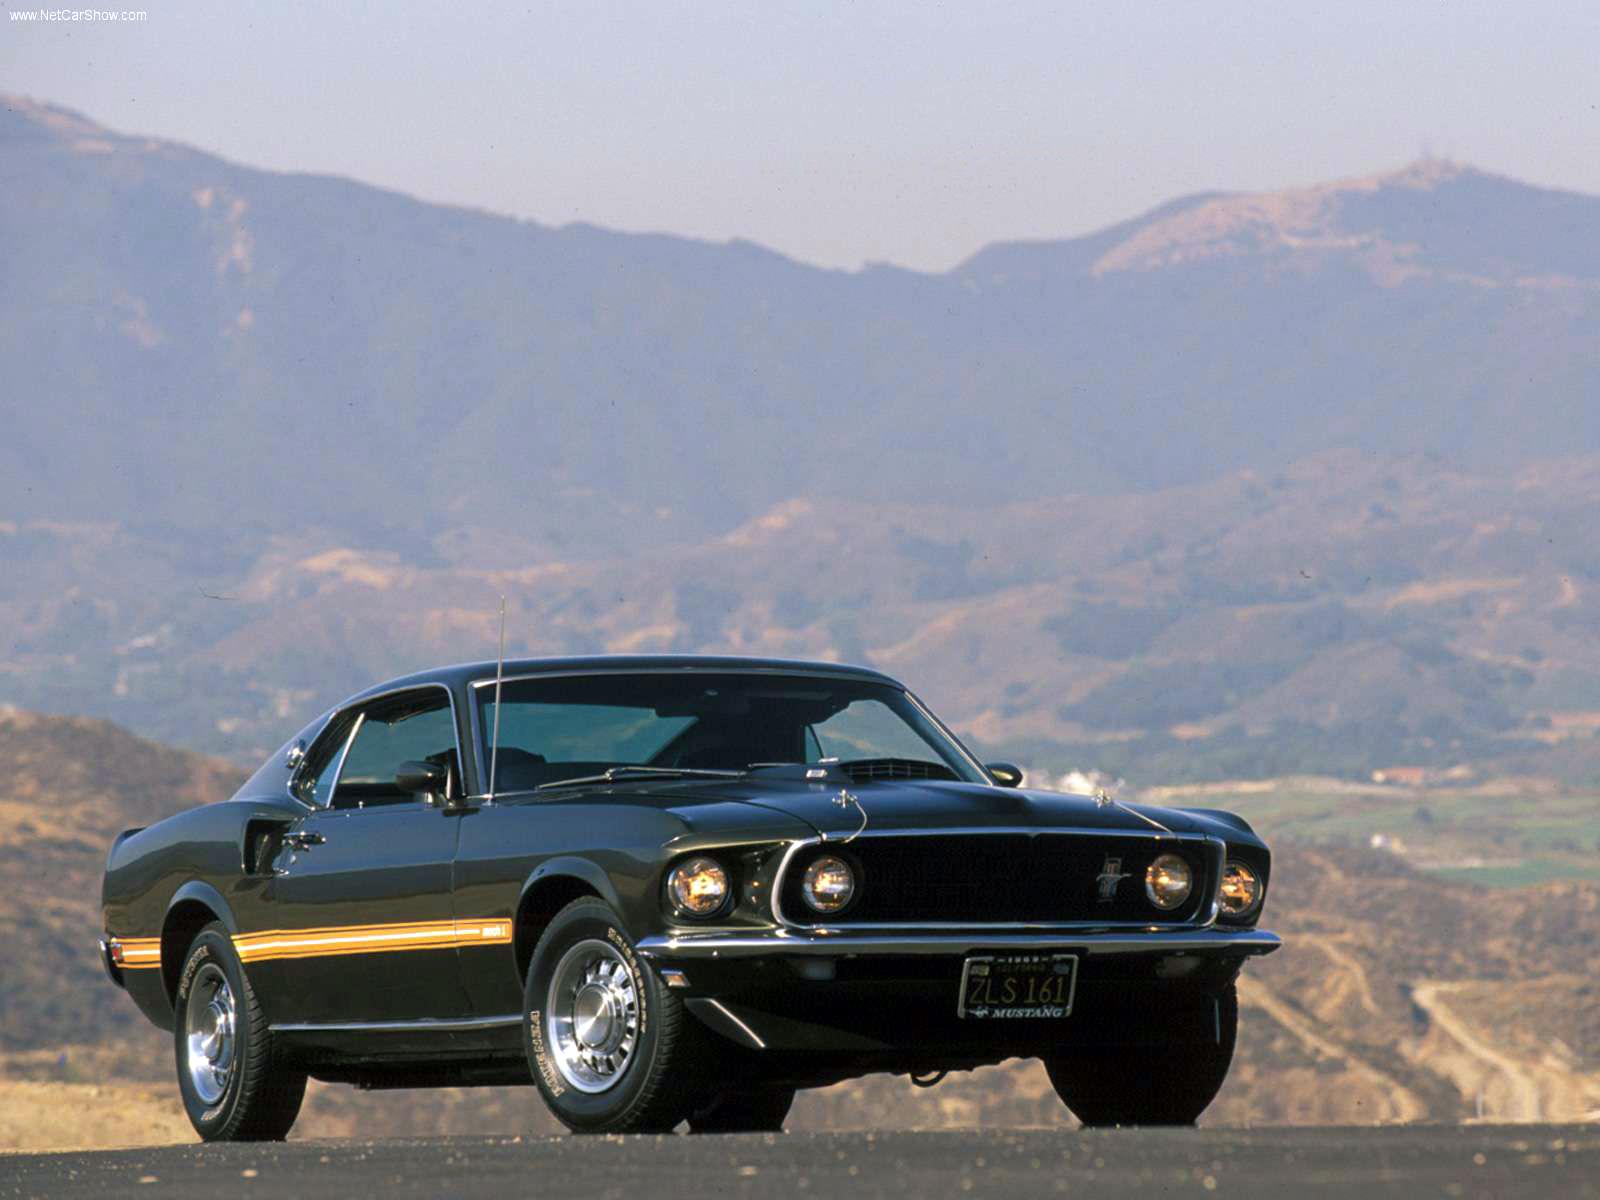 transpress nz: 1969 Ford Mustang Mach 1